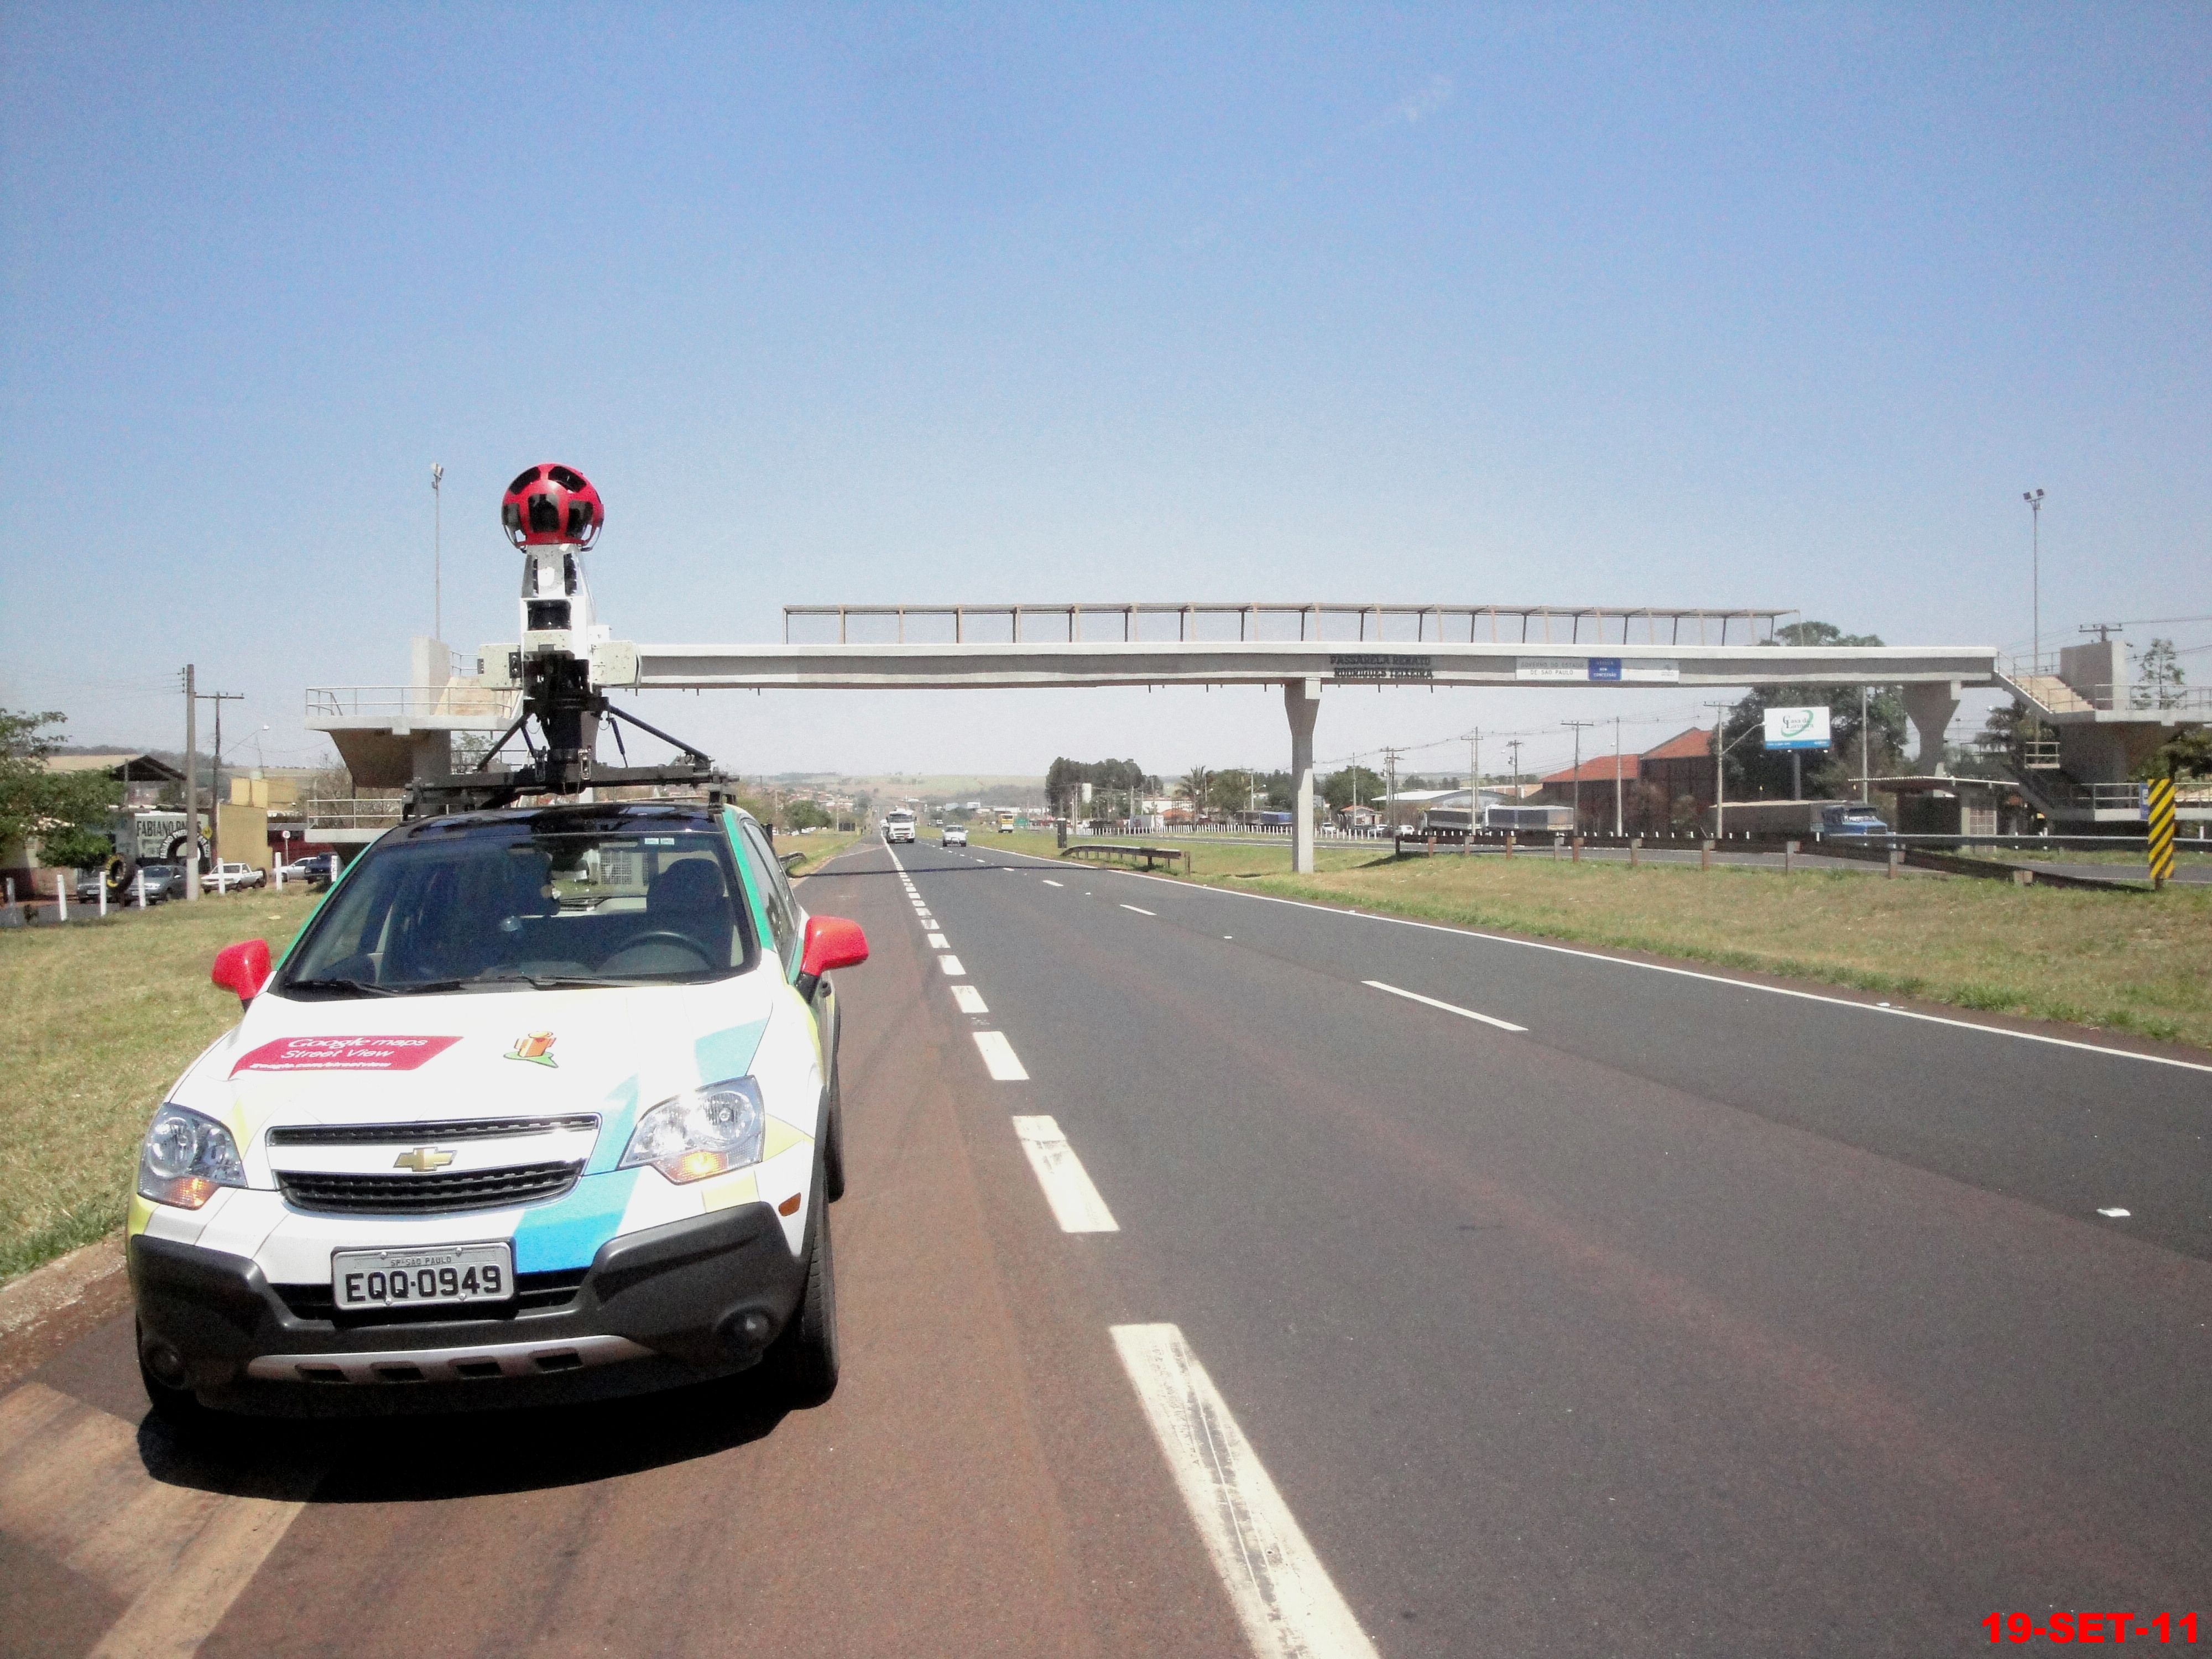 File:Carro do Google maps Street View na Rodovia Anhanguera SP-330 on